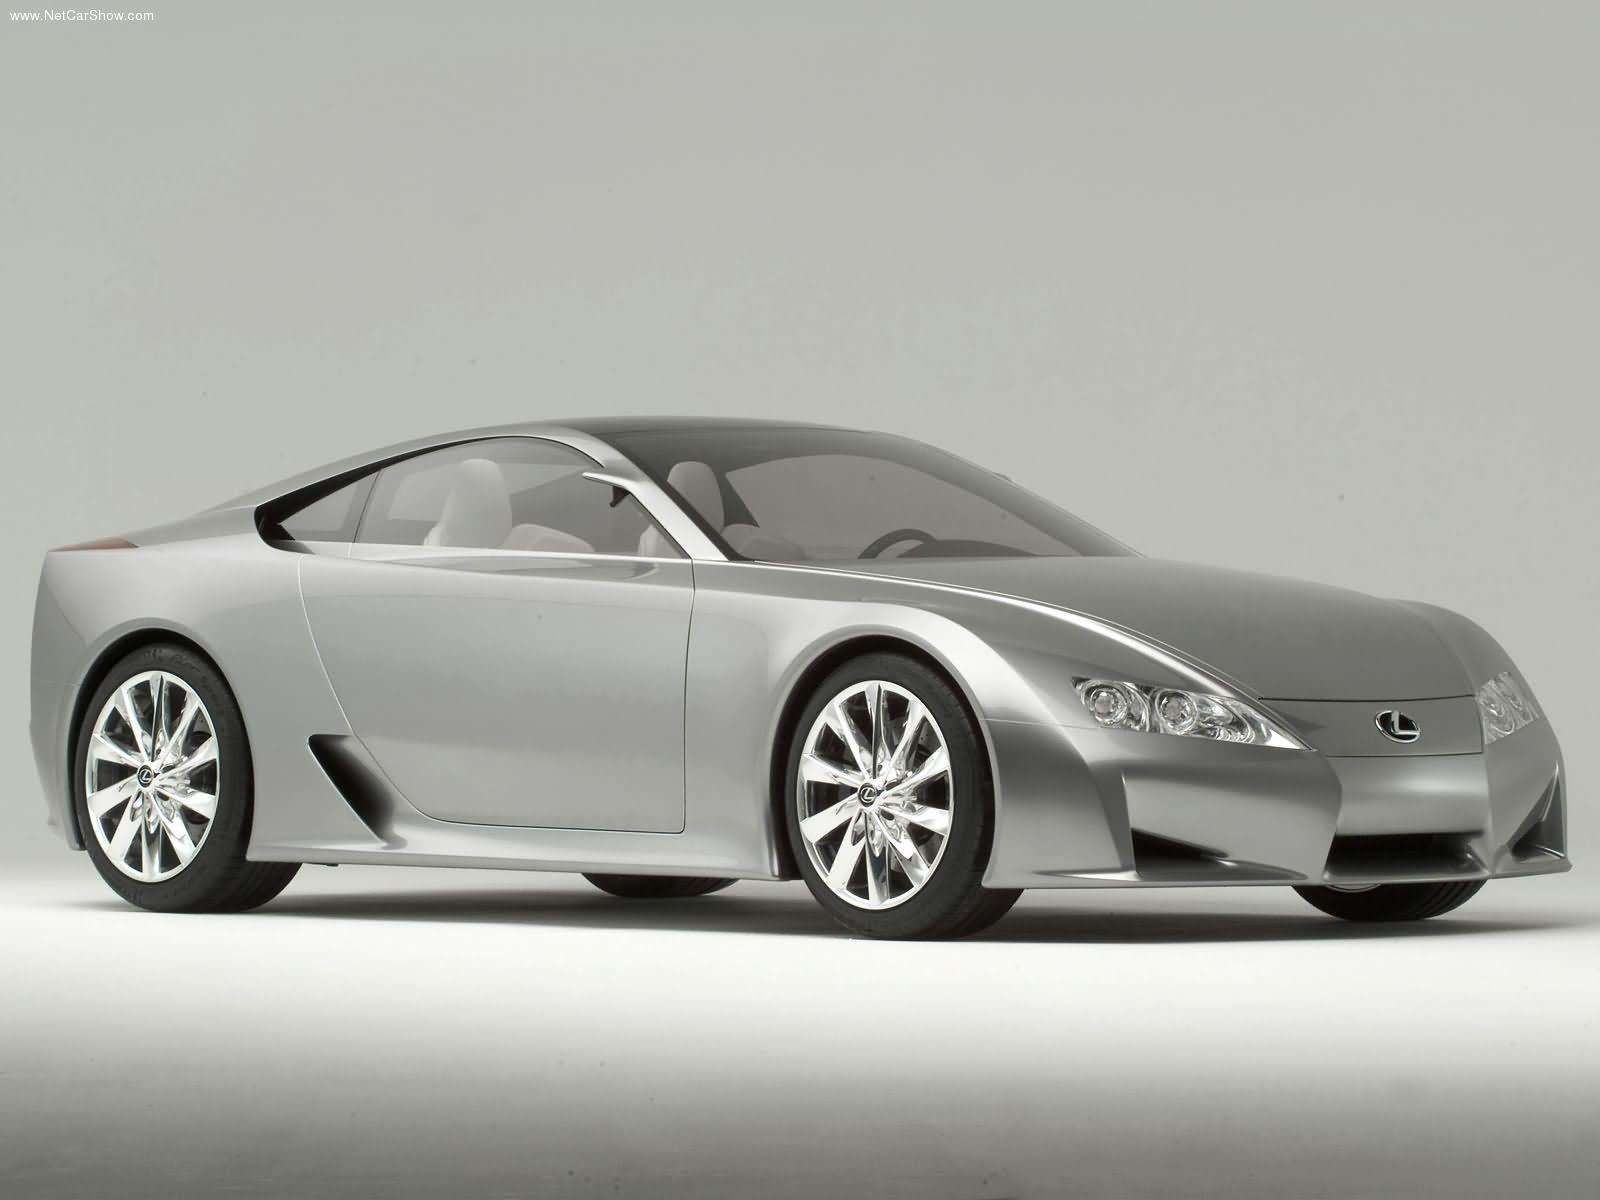 Lexus LFA Concept (2005) | classic cars | Pinterest | Lexus LFA ...